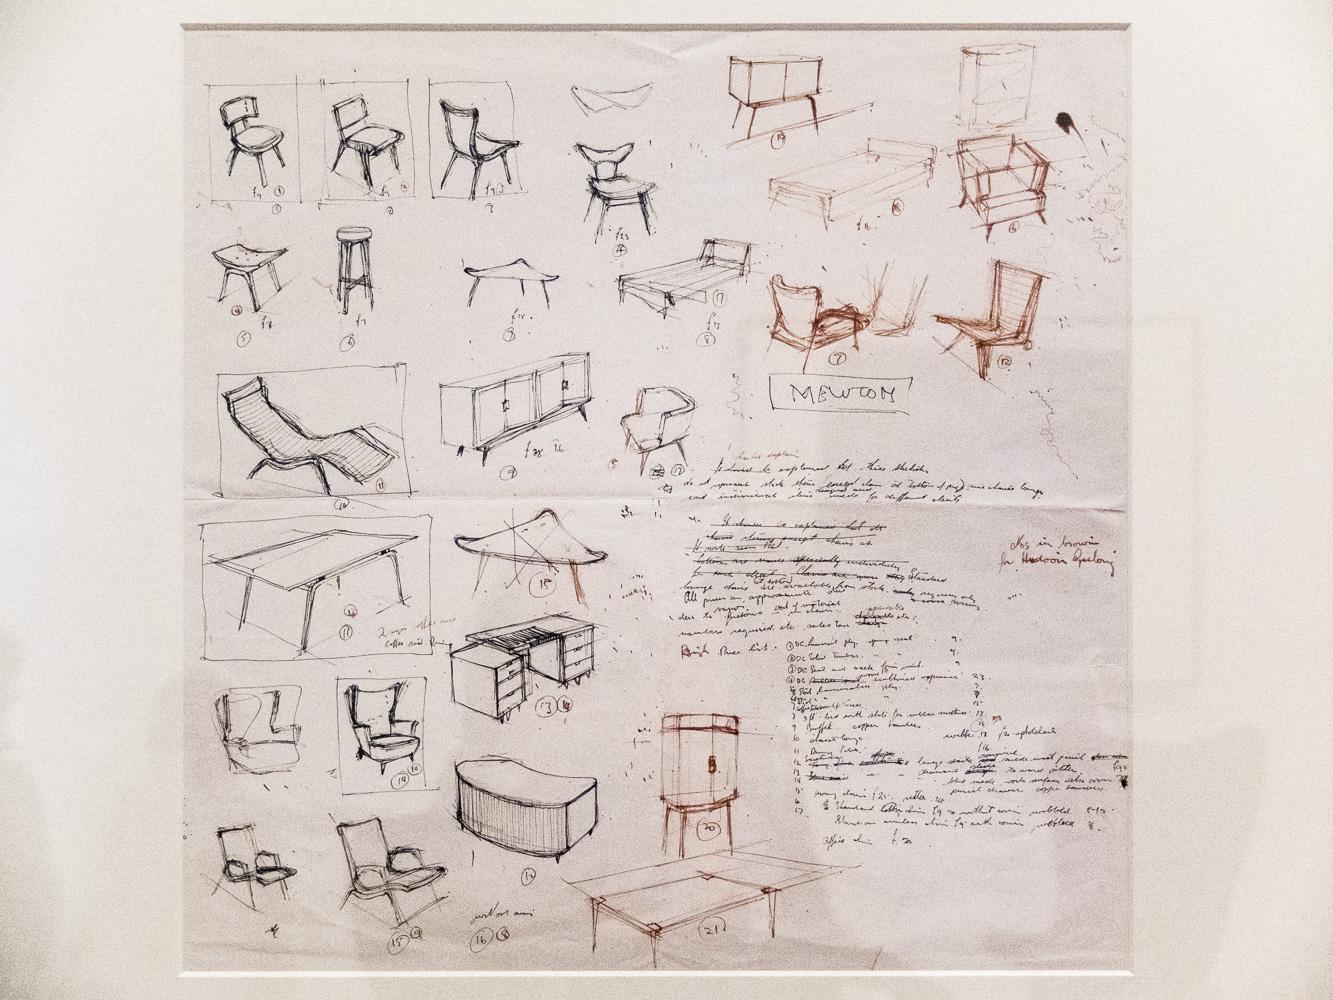 Heide Featherston Exhibition Cantilever Interiors Furniture Design (59).JPG